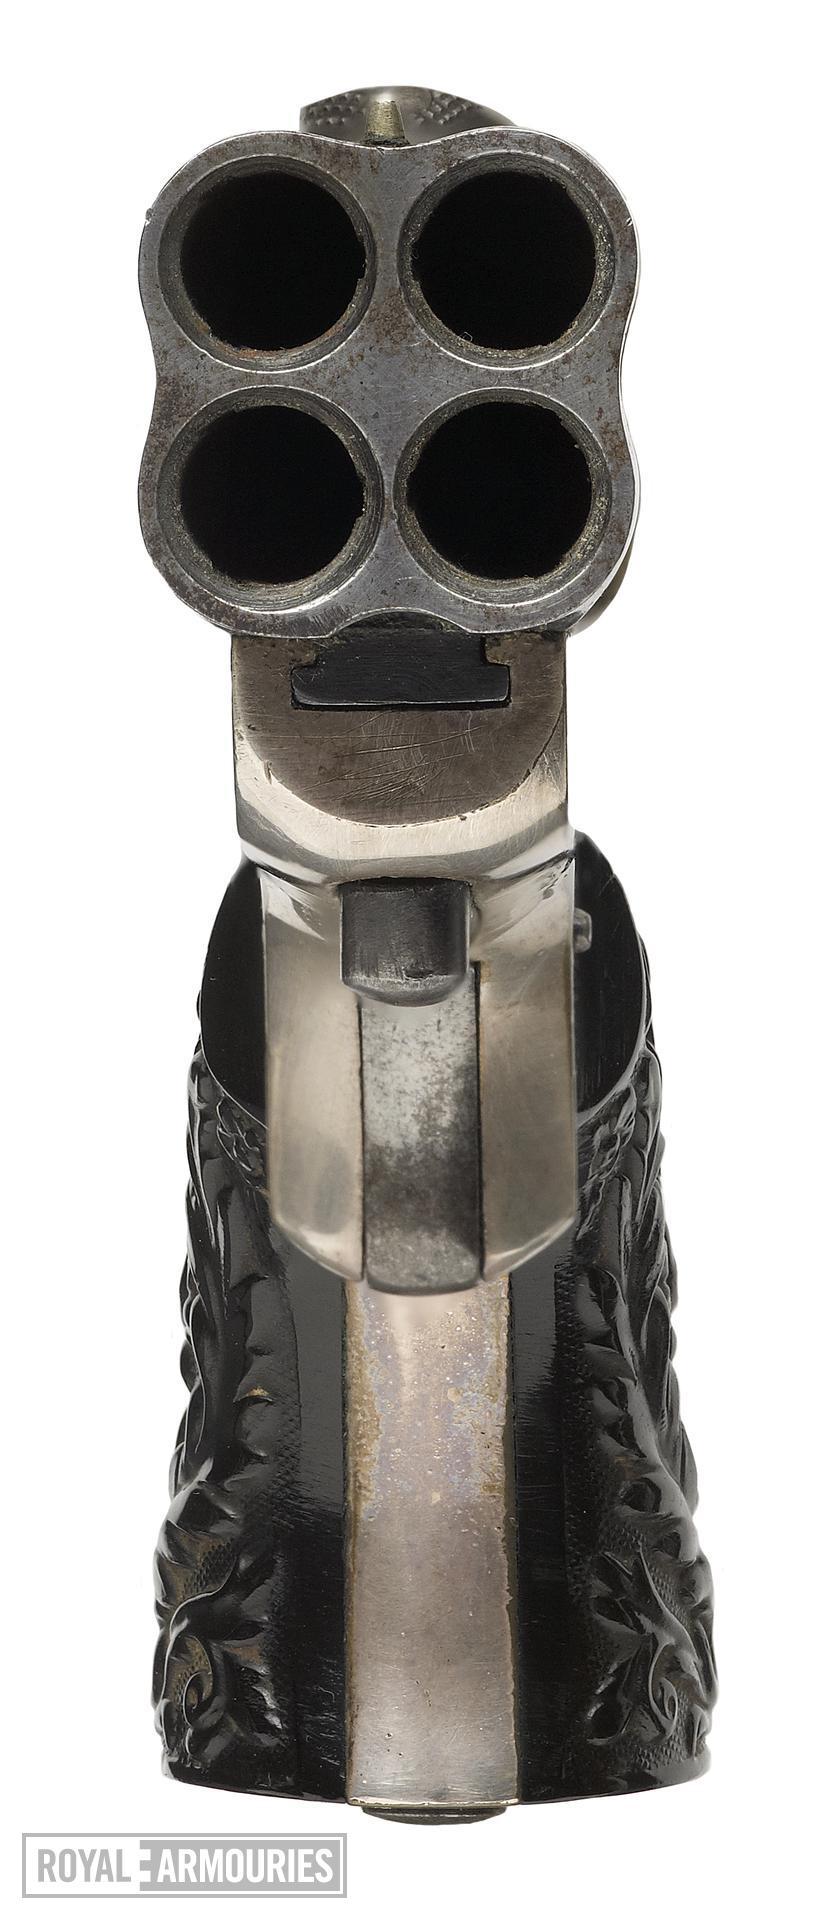 Rimfire breech-loading four-barrelled pistol - Sharps 1849 Patent